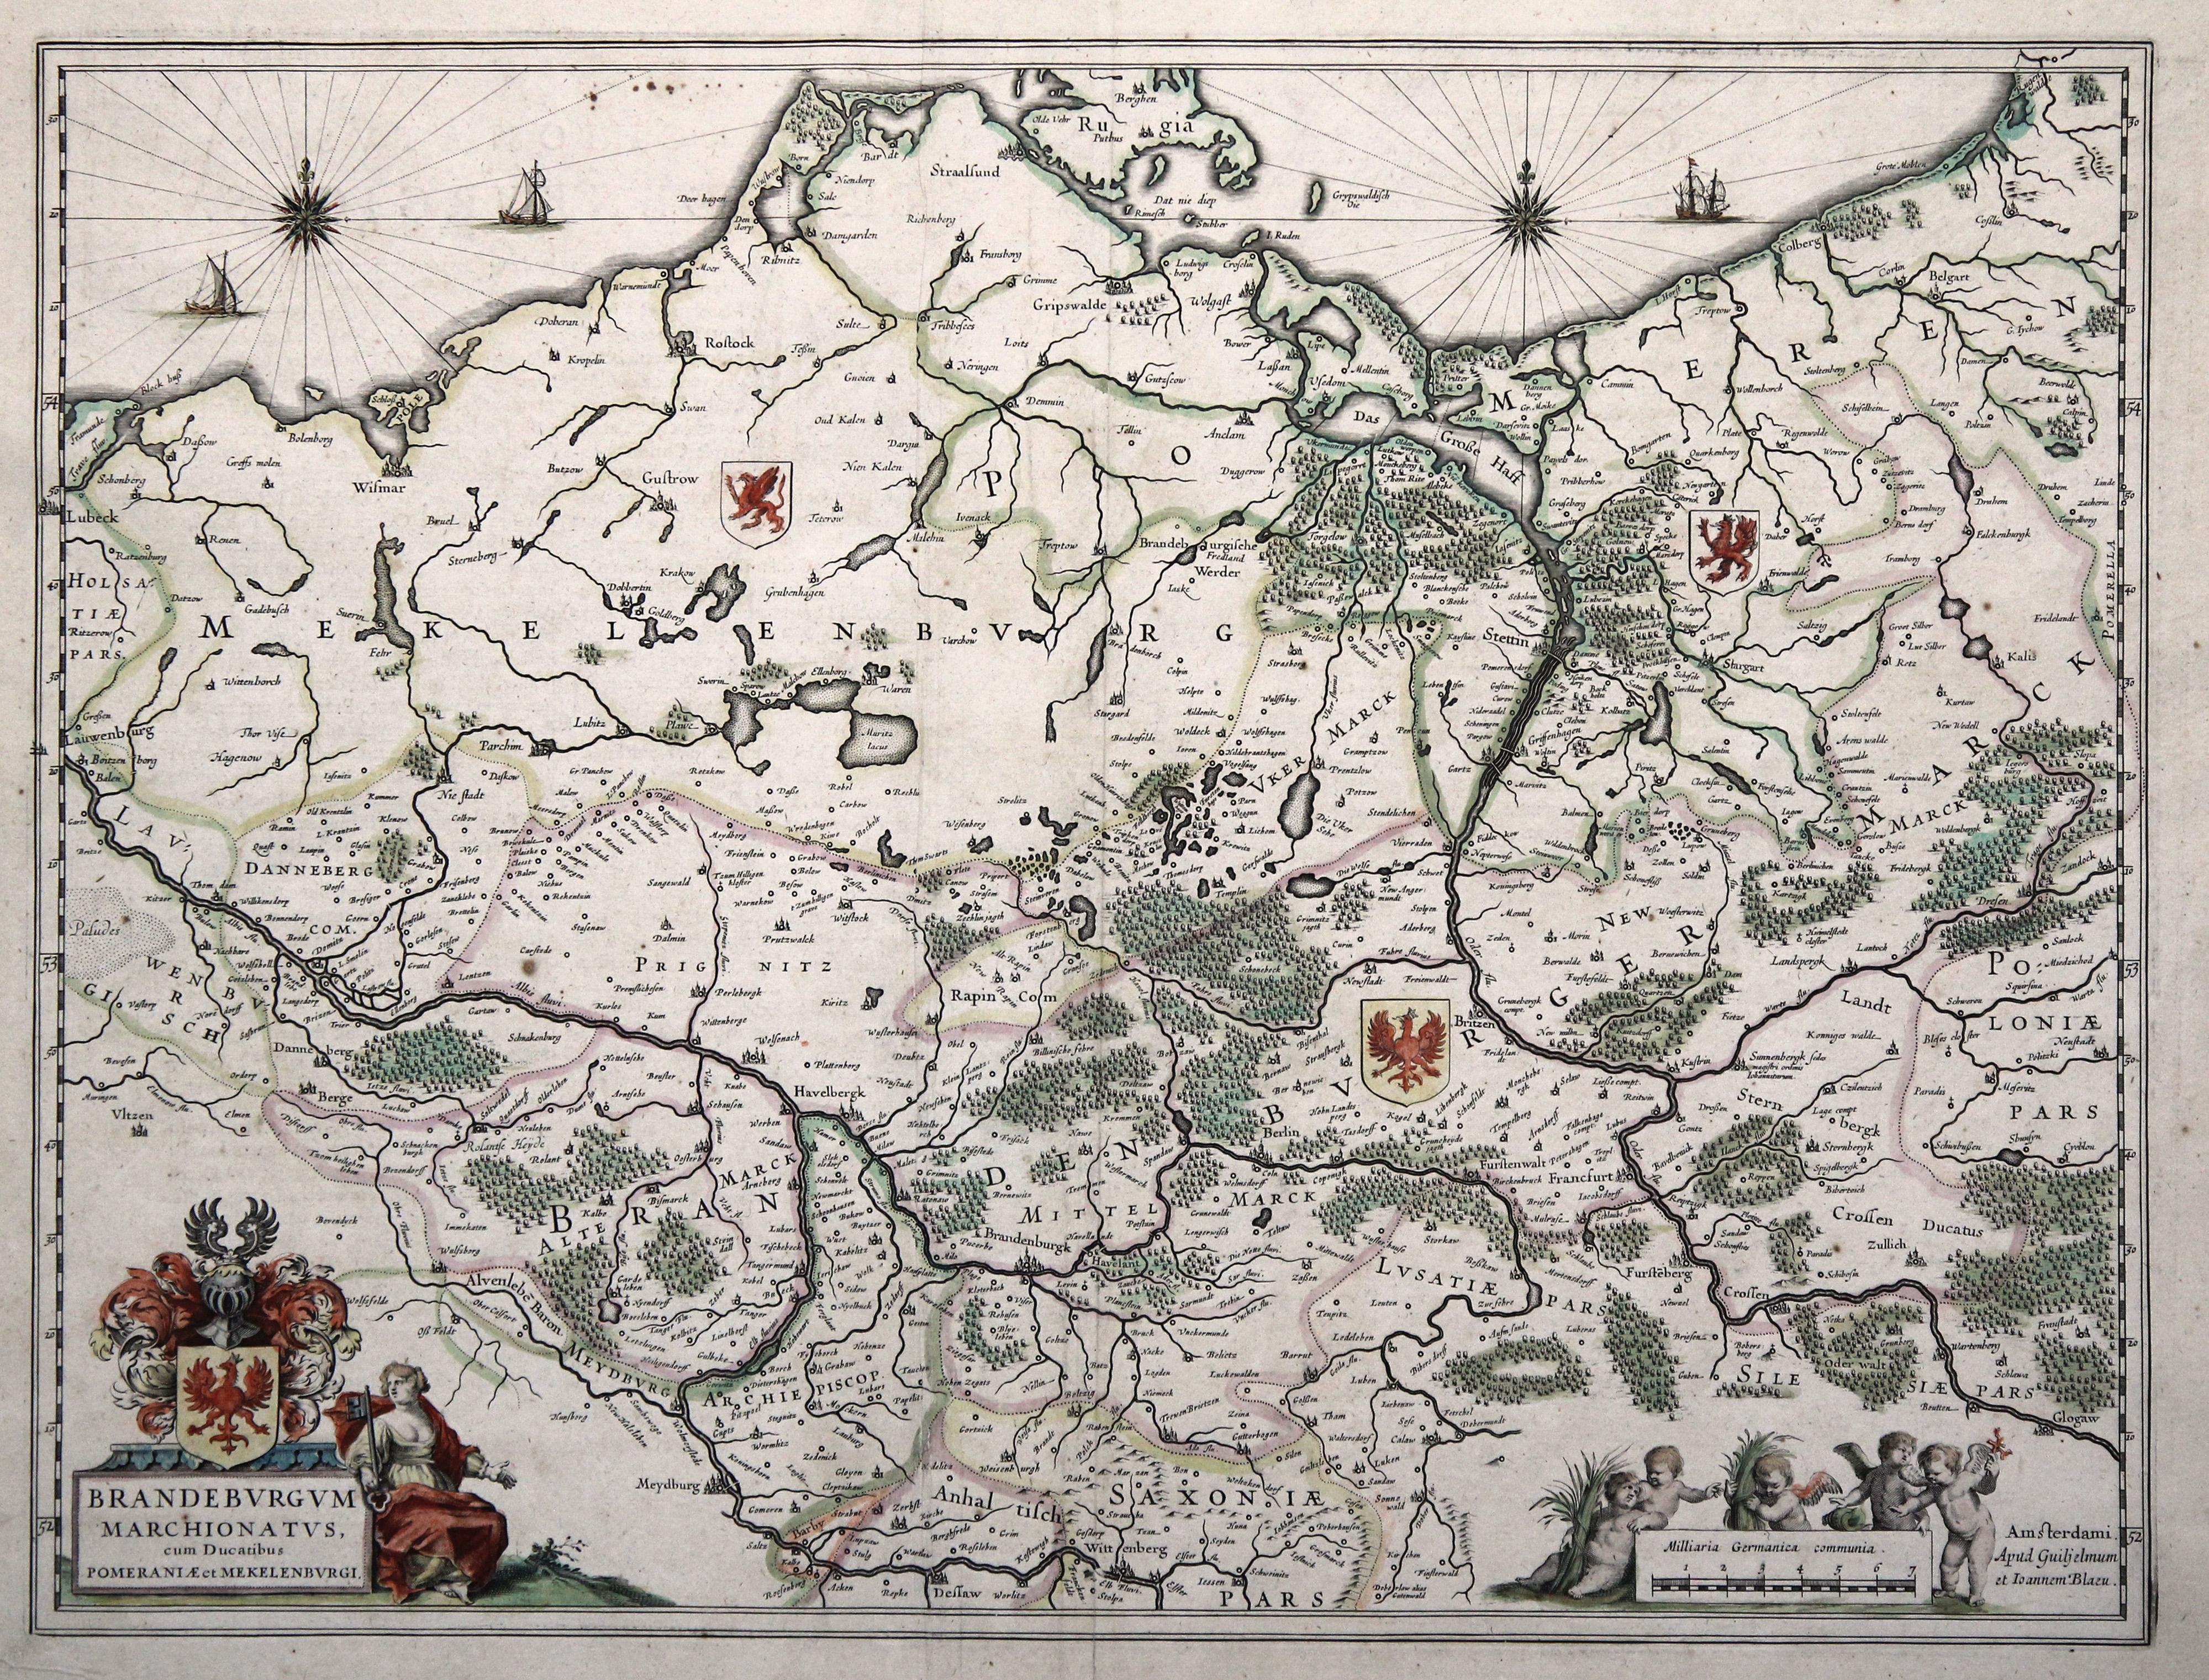 Brandenburg Mecklenburg